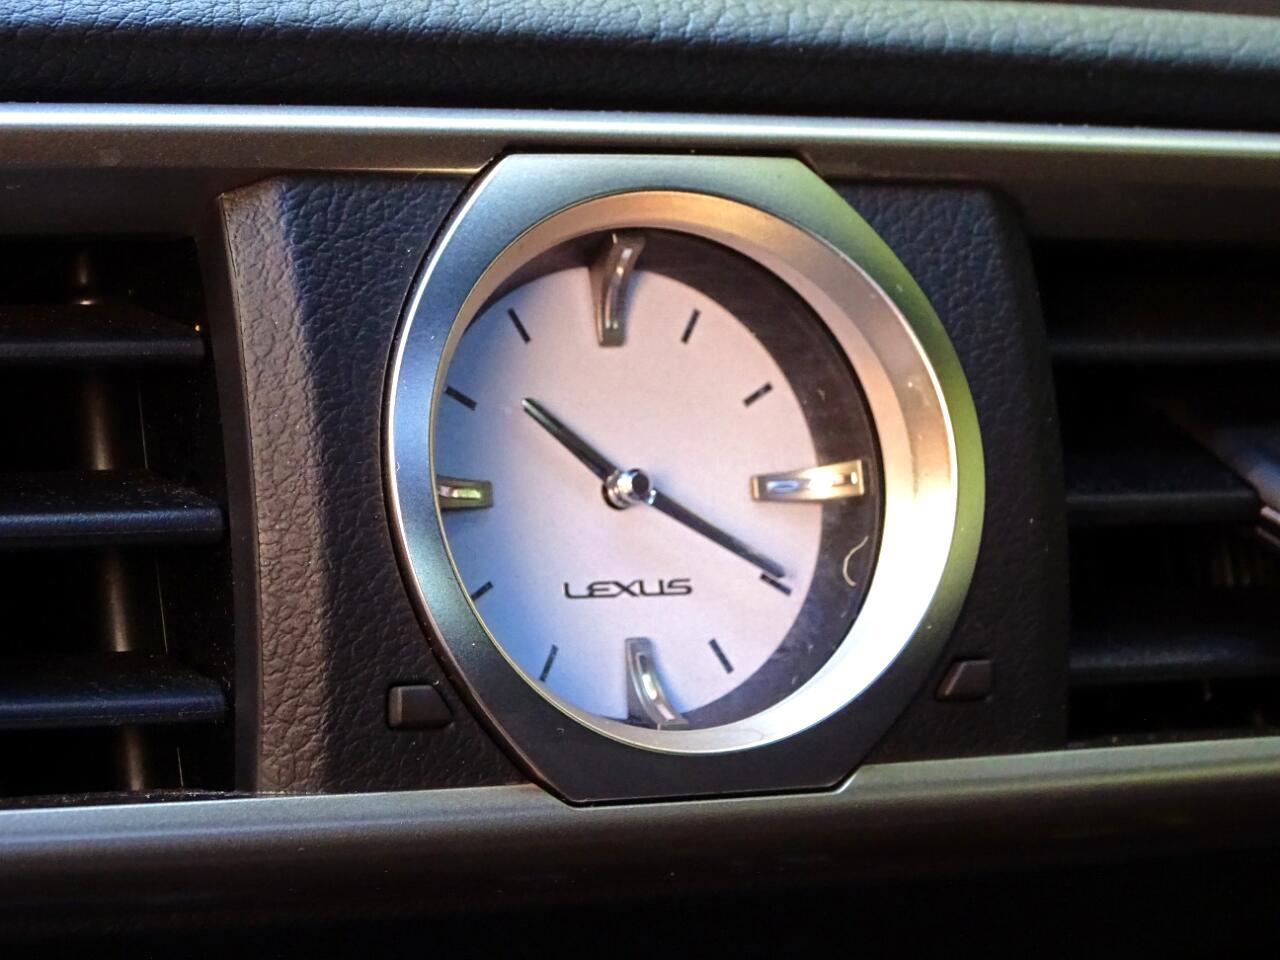 2015 Lexus RC 350 2dr Cpe RWD